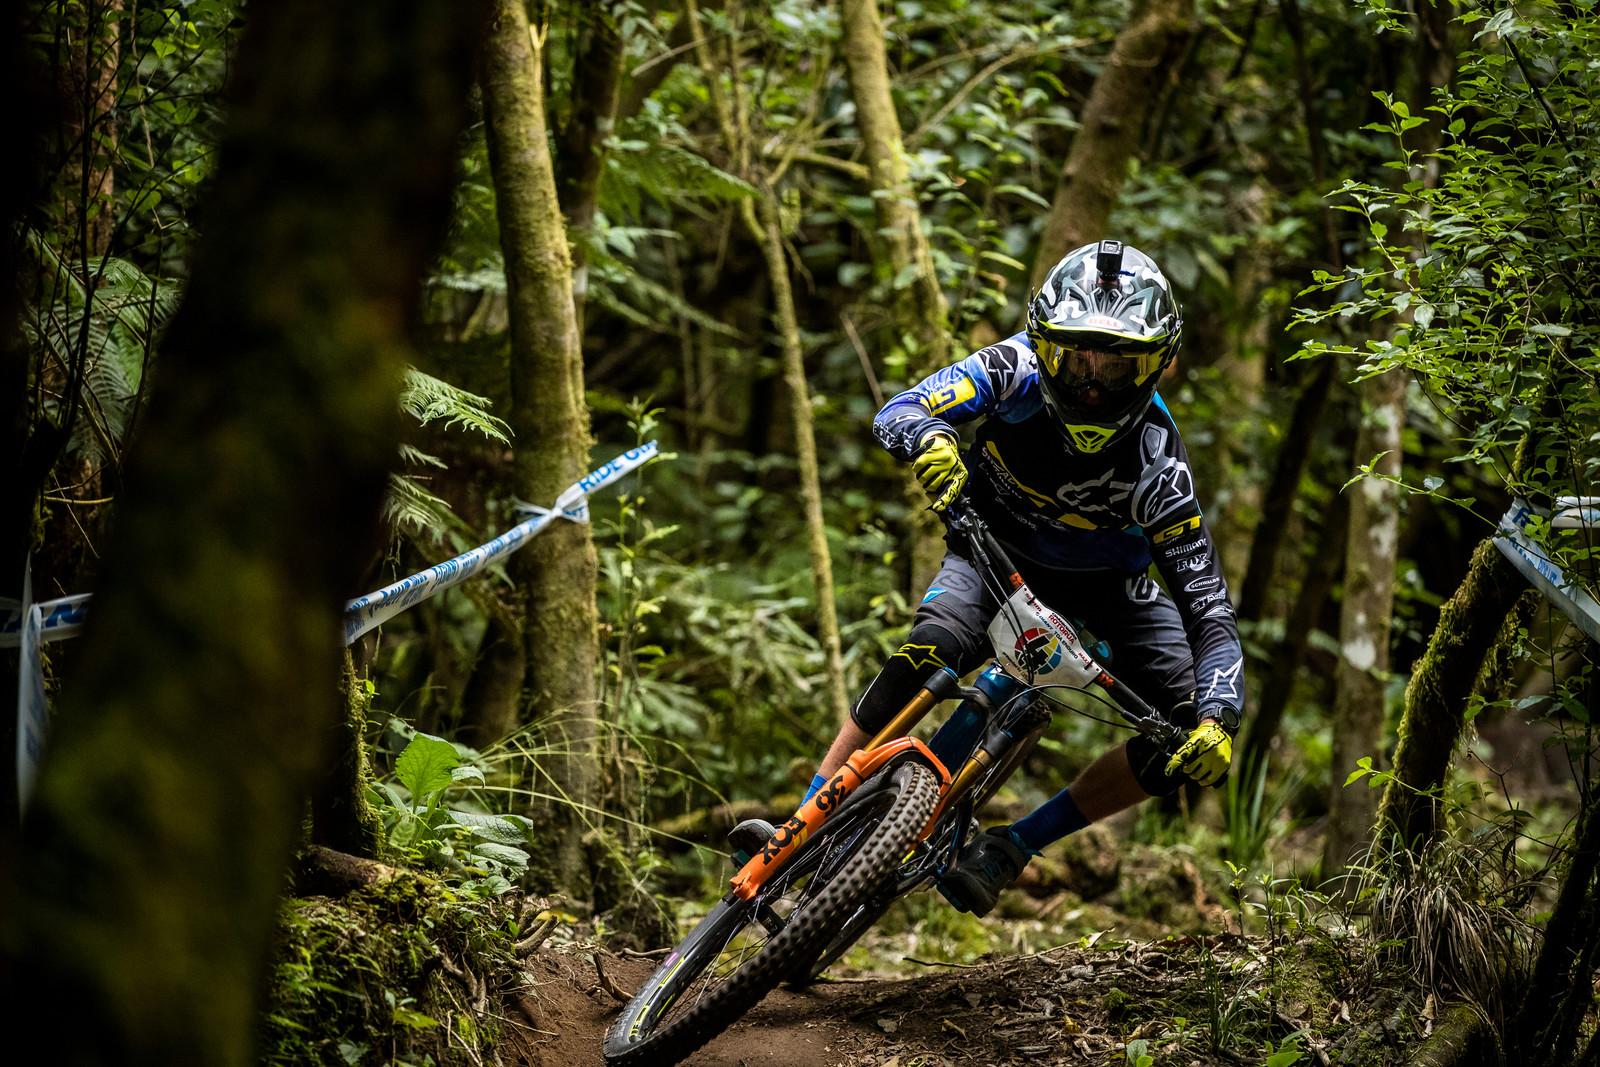 Martin Maes - 2019 Enduro World Series Crankworx Rotorua - Mountain Biking Pictures - Vital MTB